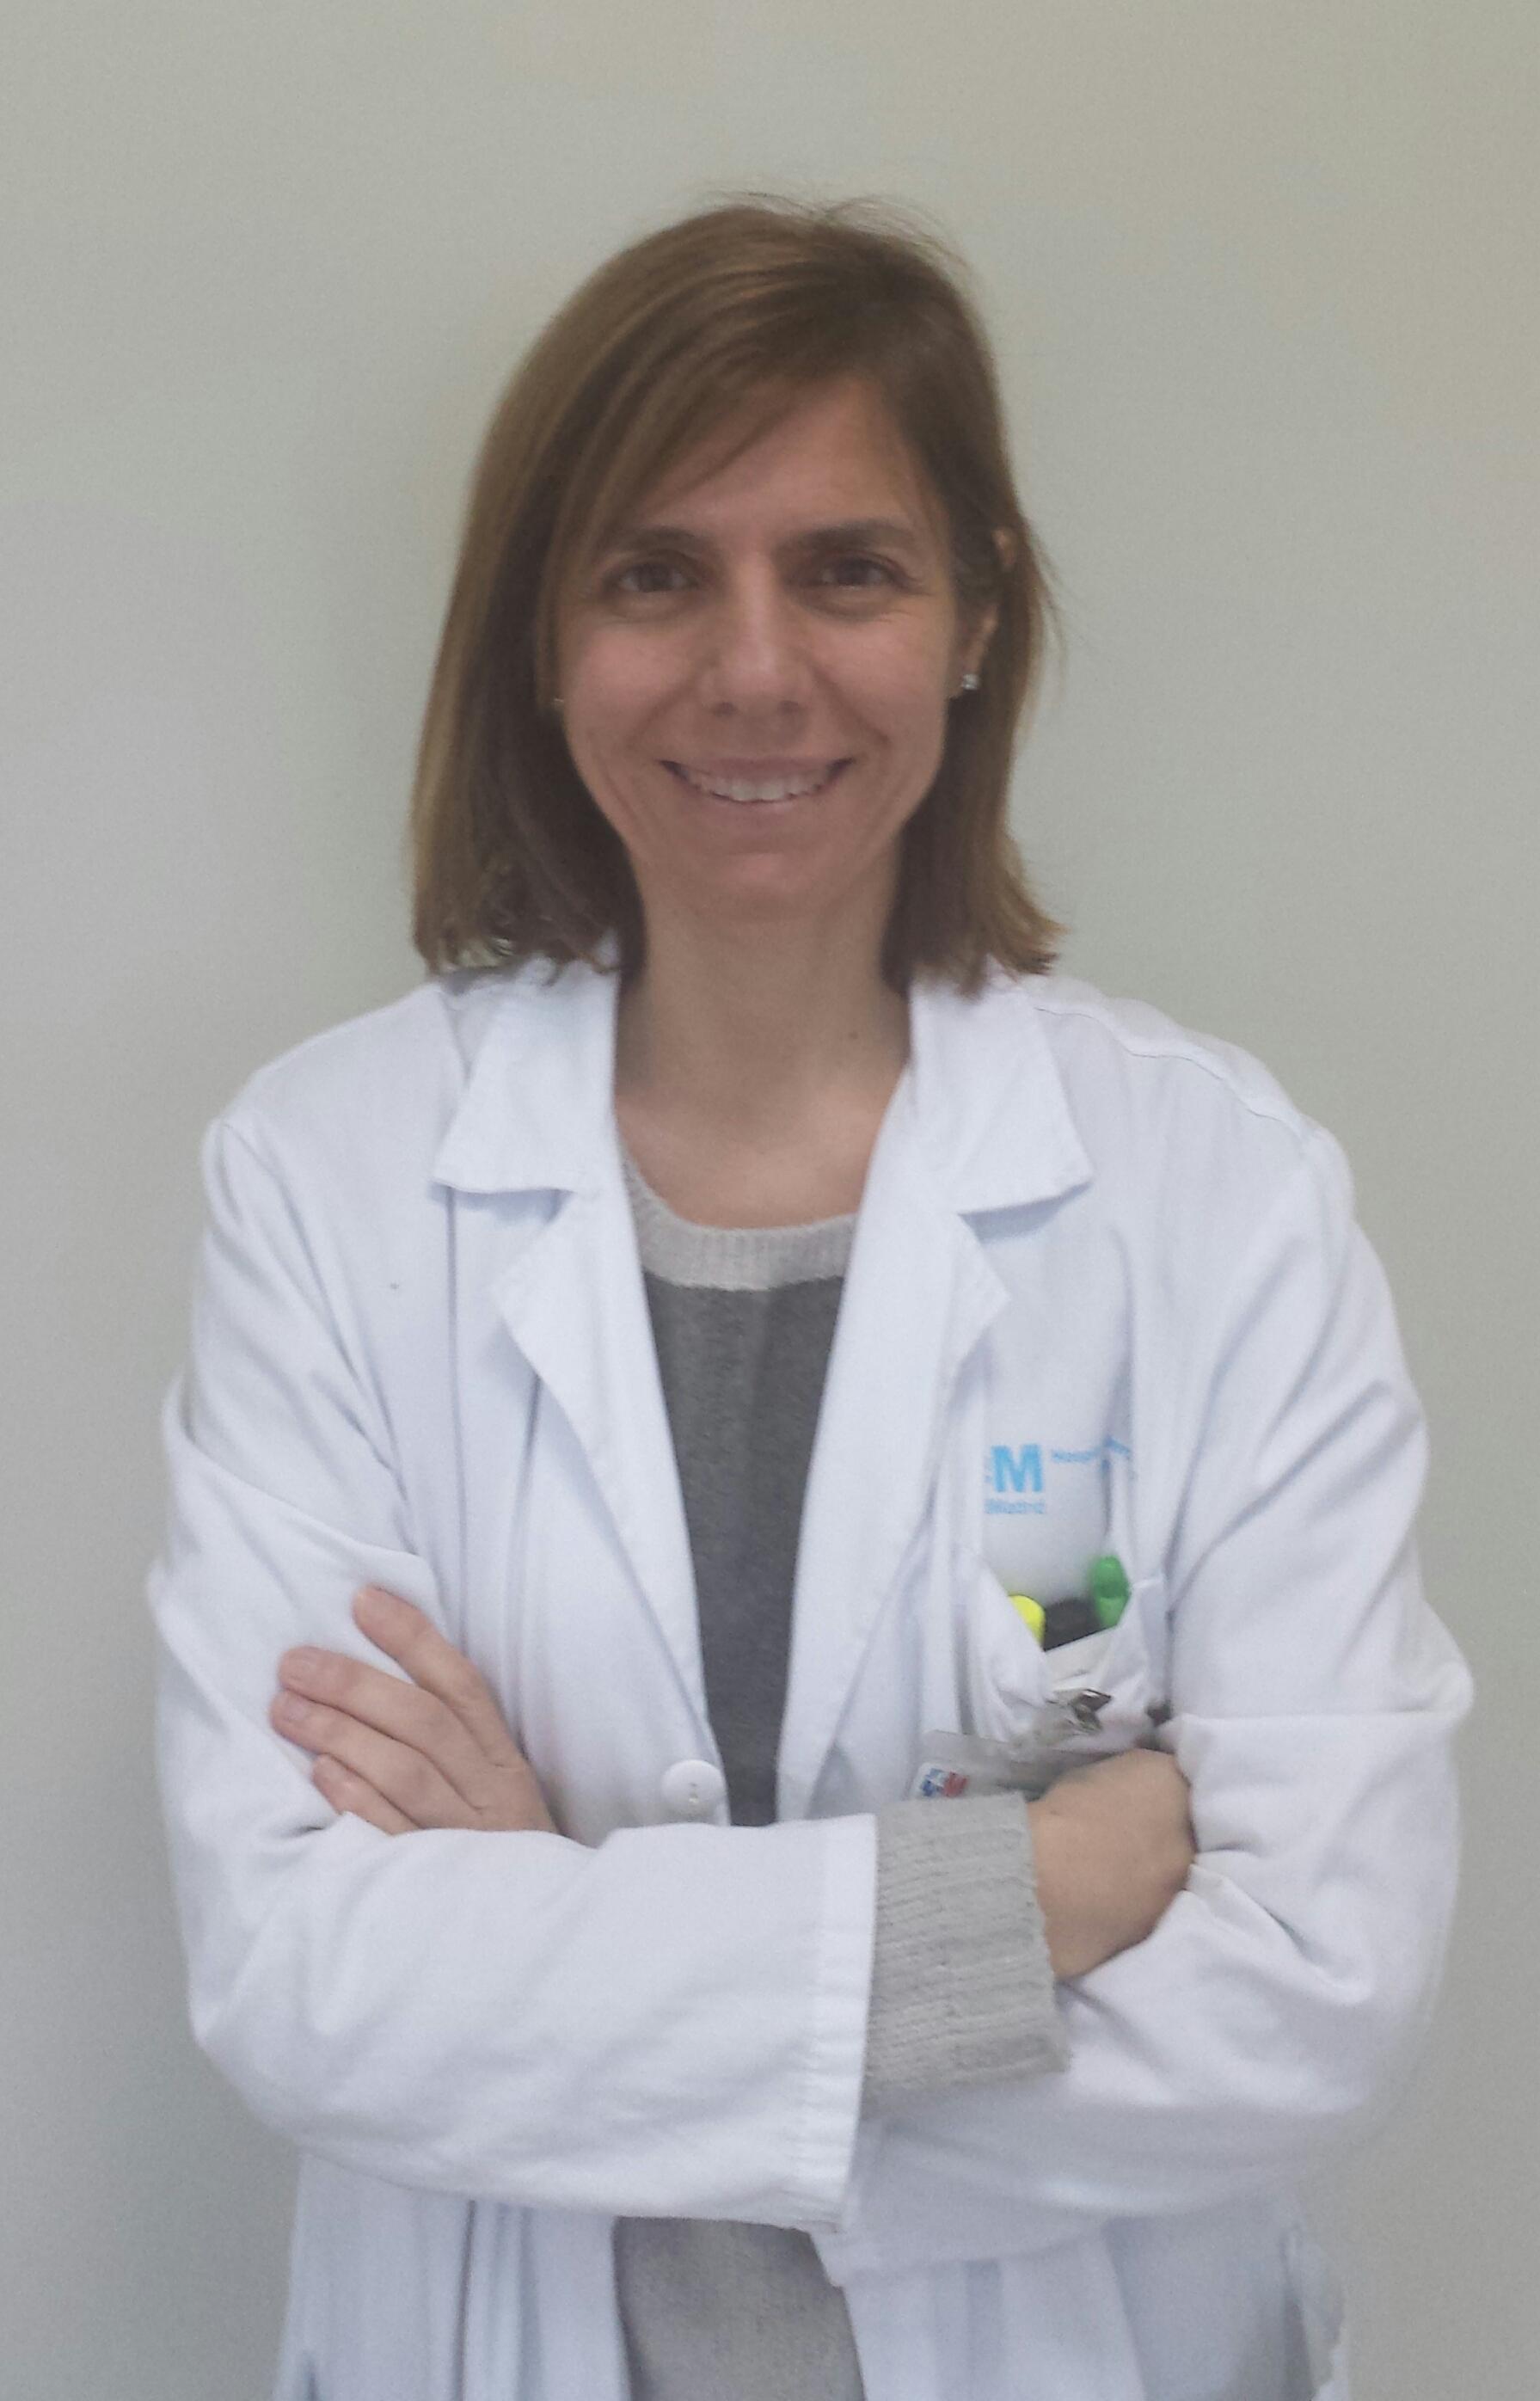 Maria Teresa Alvarez Romàn, MD, PhD